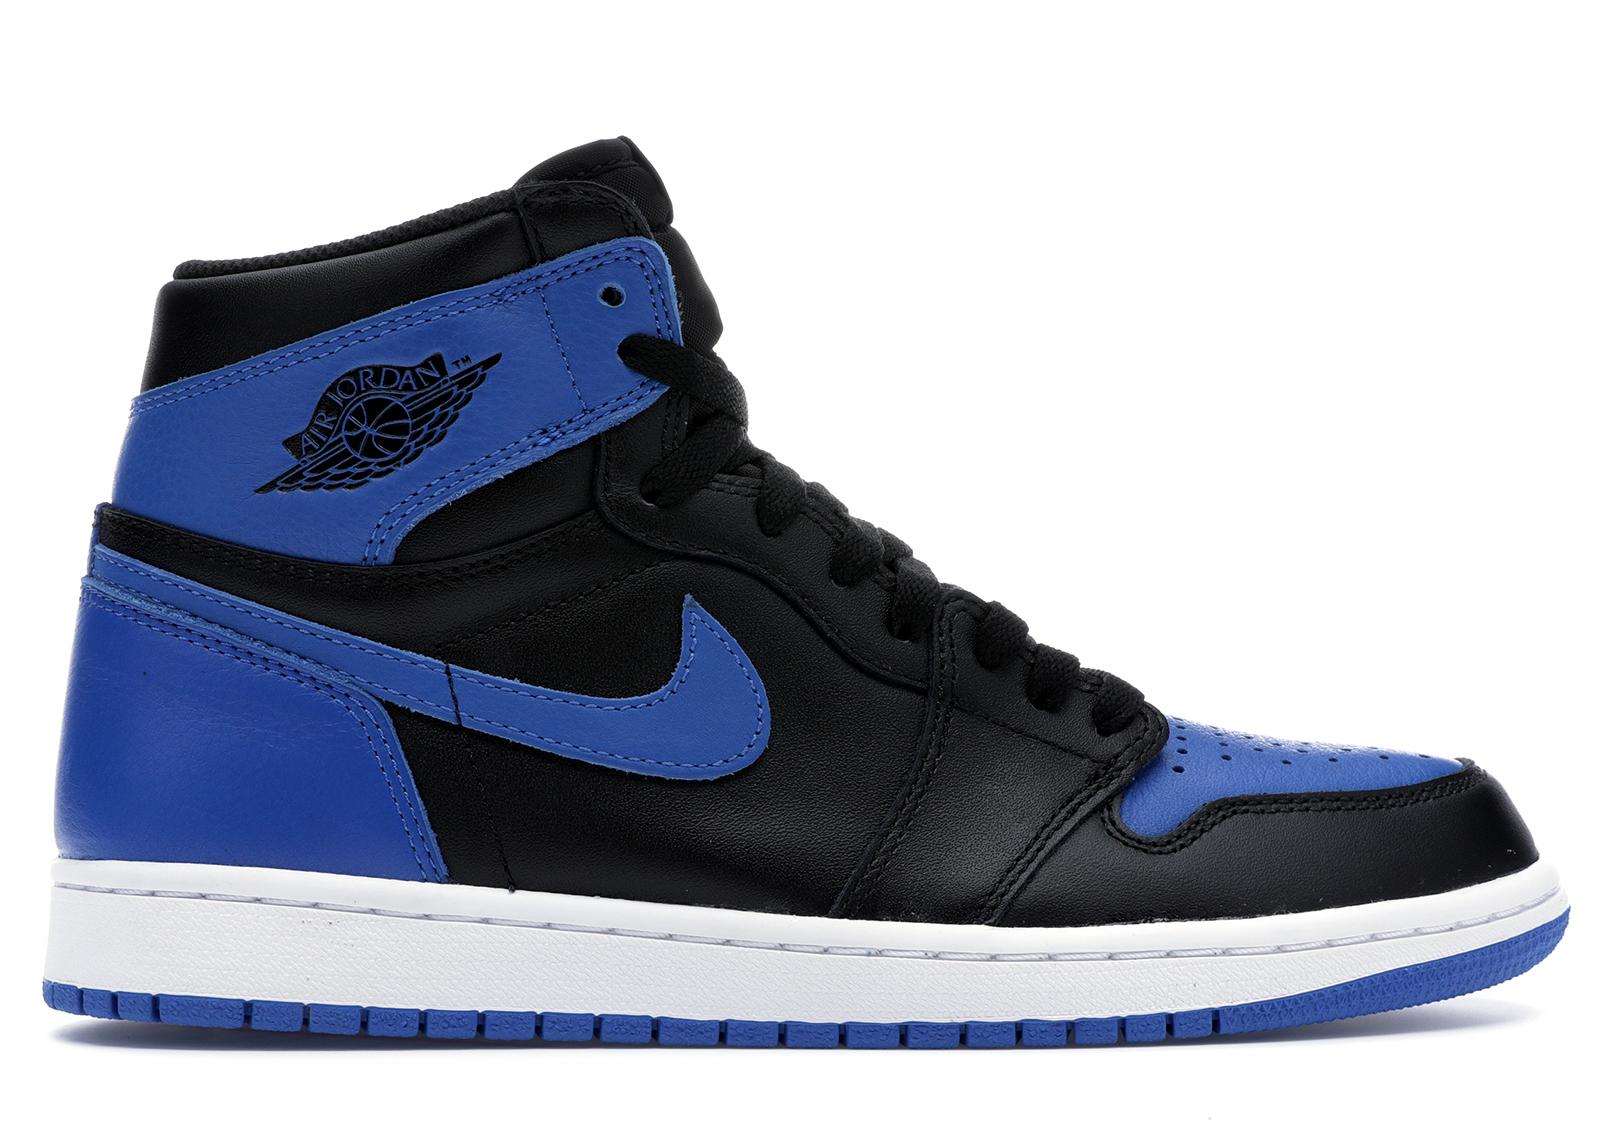 Jordan 1 Retro Black Royal Blue (2013